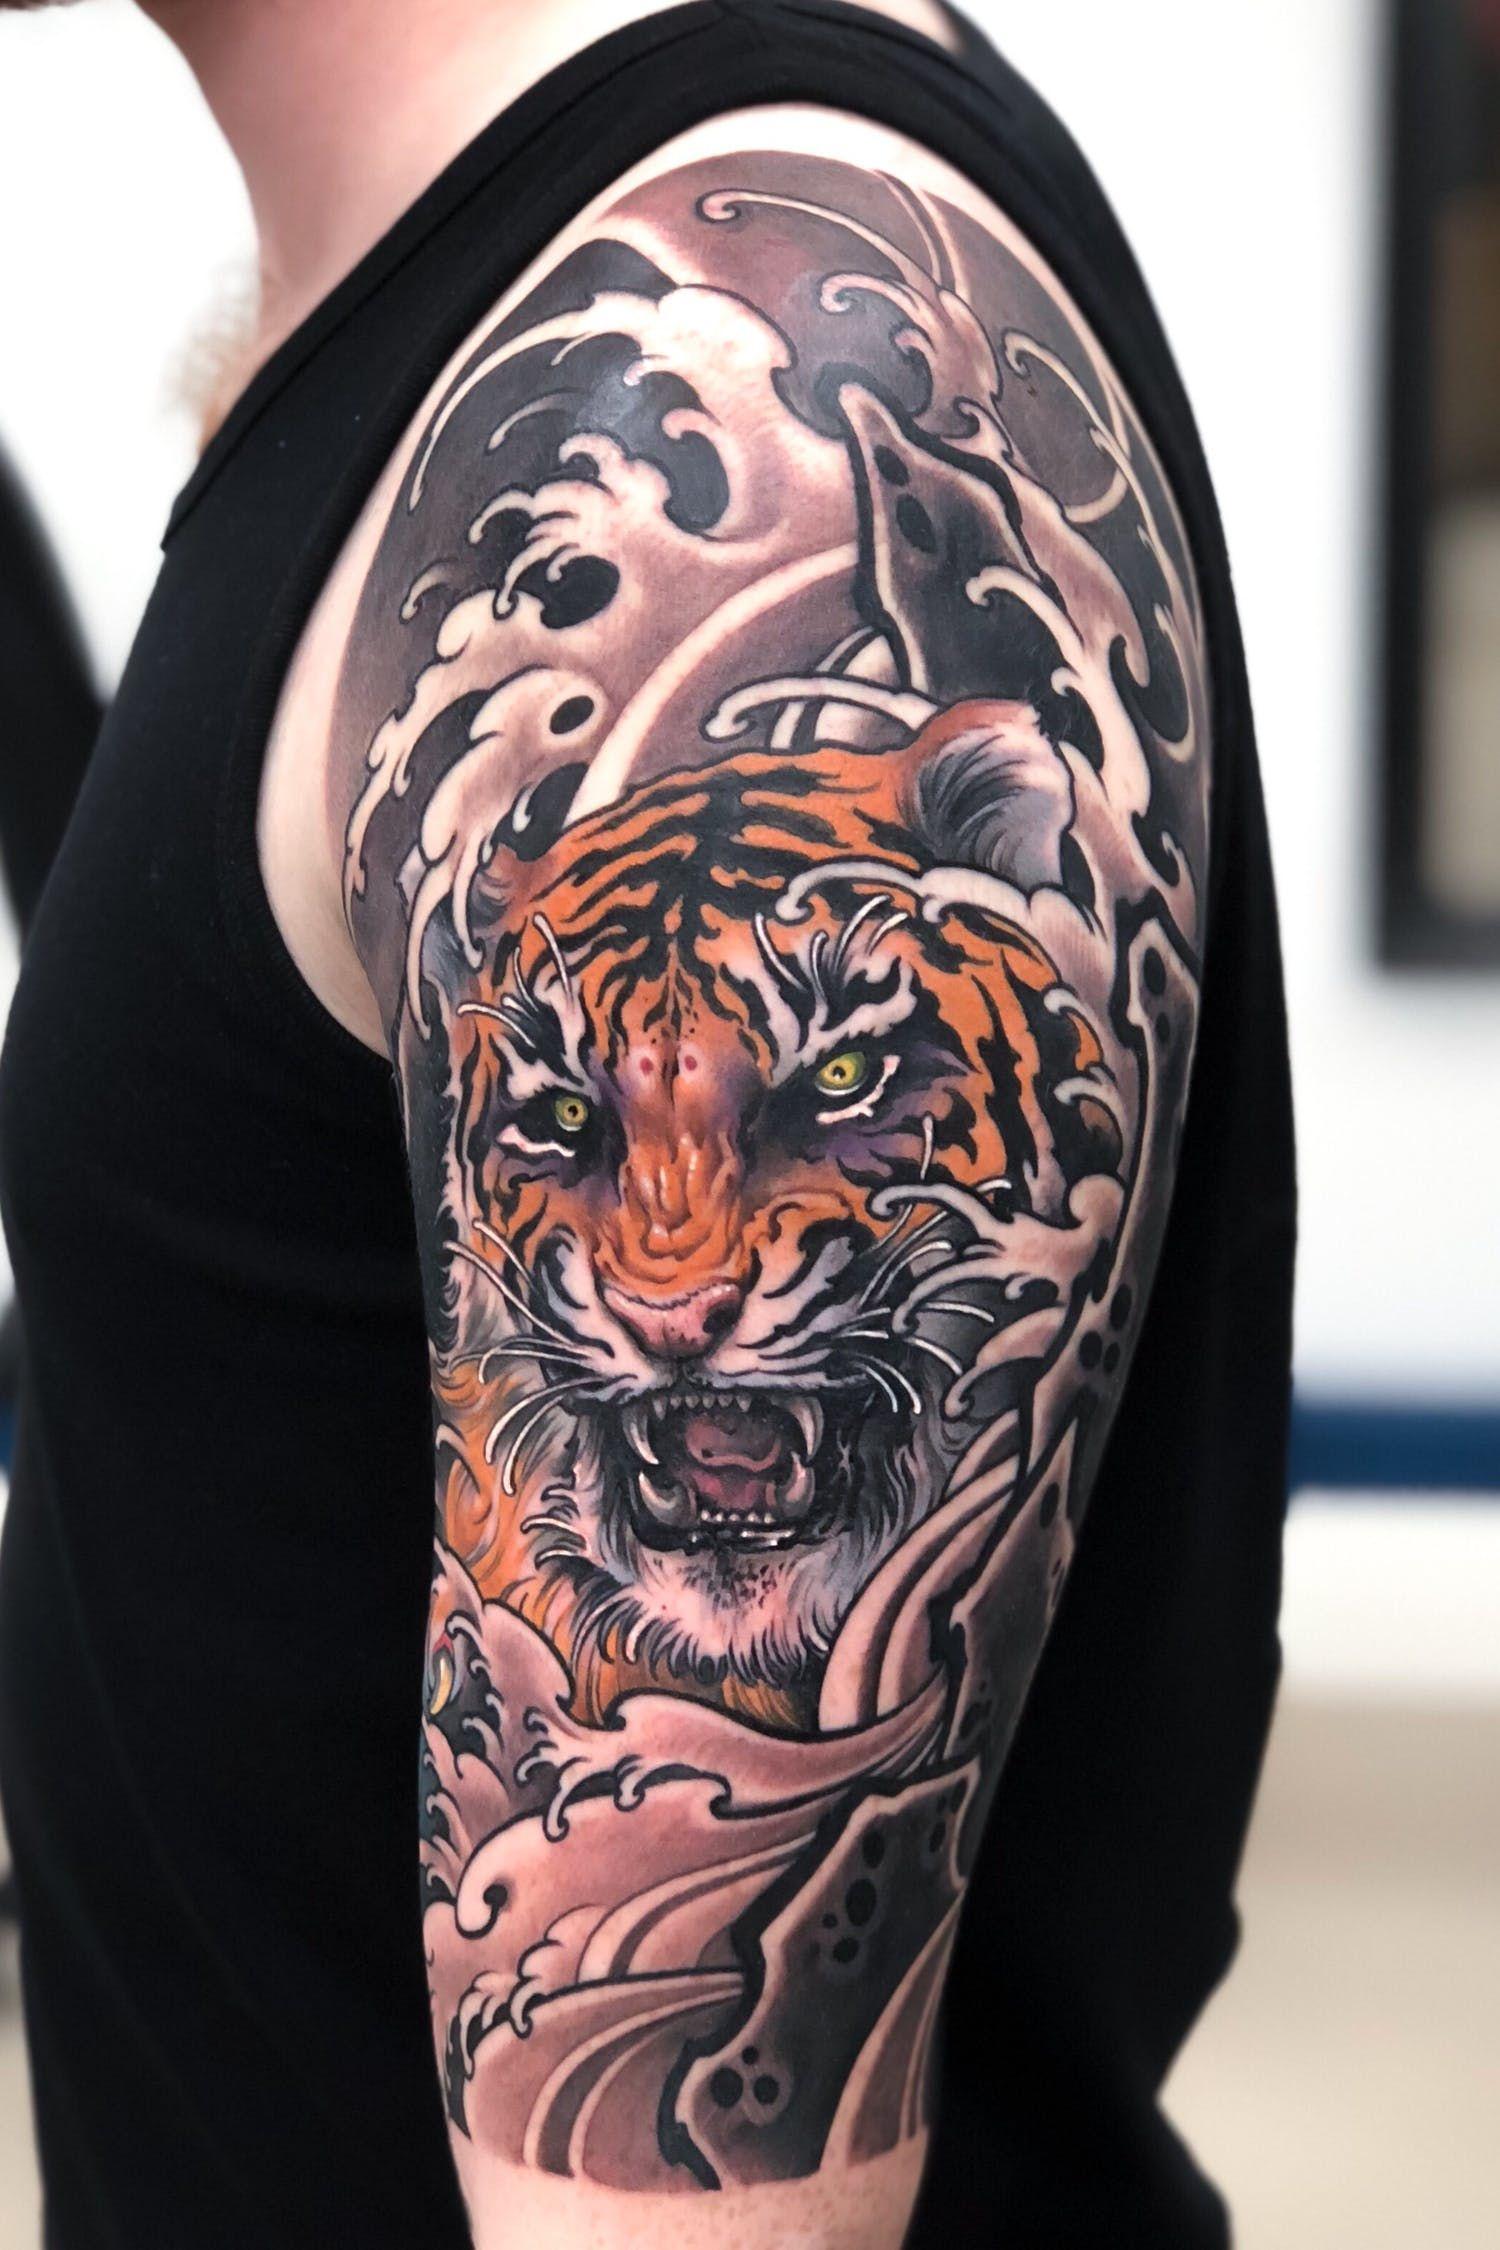 Tiger Rocks And Waves Tattoodo Inkjecta Wearesorrymom Killerinktattoo Tiger Irezumi Japanese Tattoos For Men Japanese Tiger Tattoo Japanese Tattoo